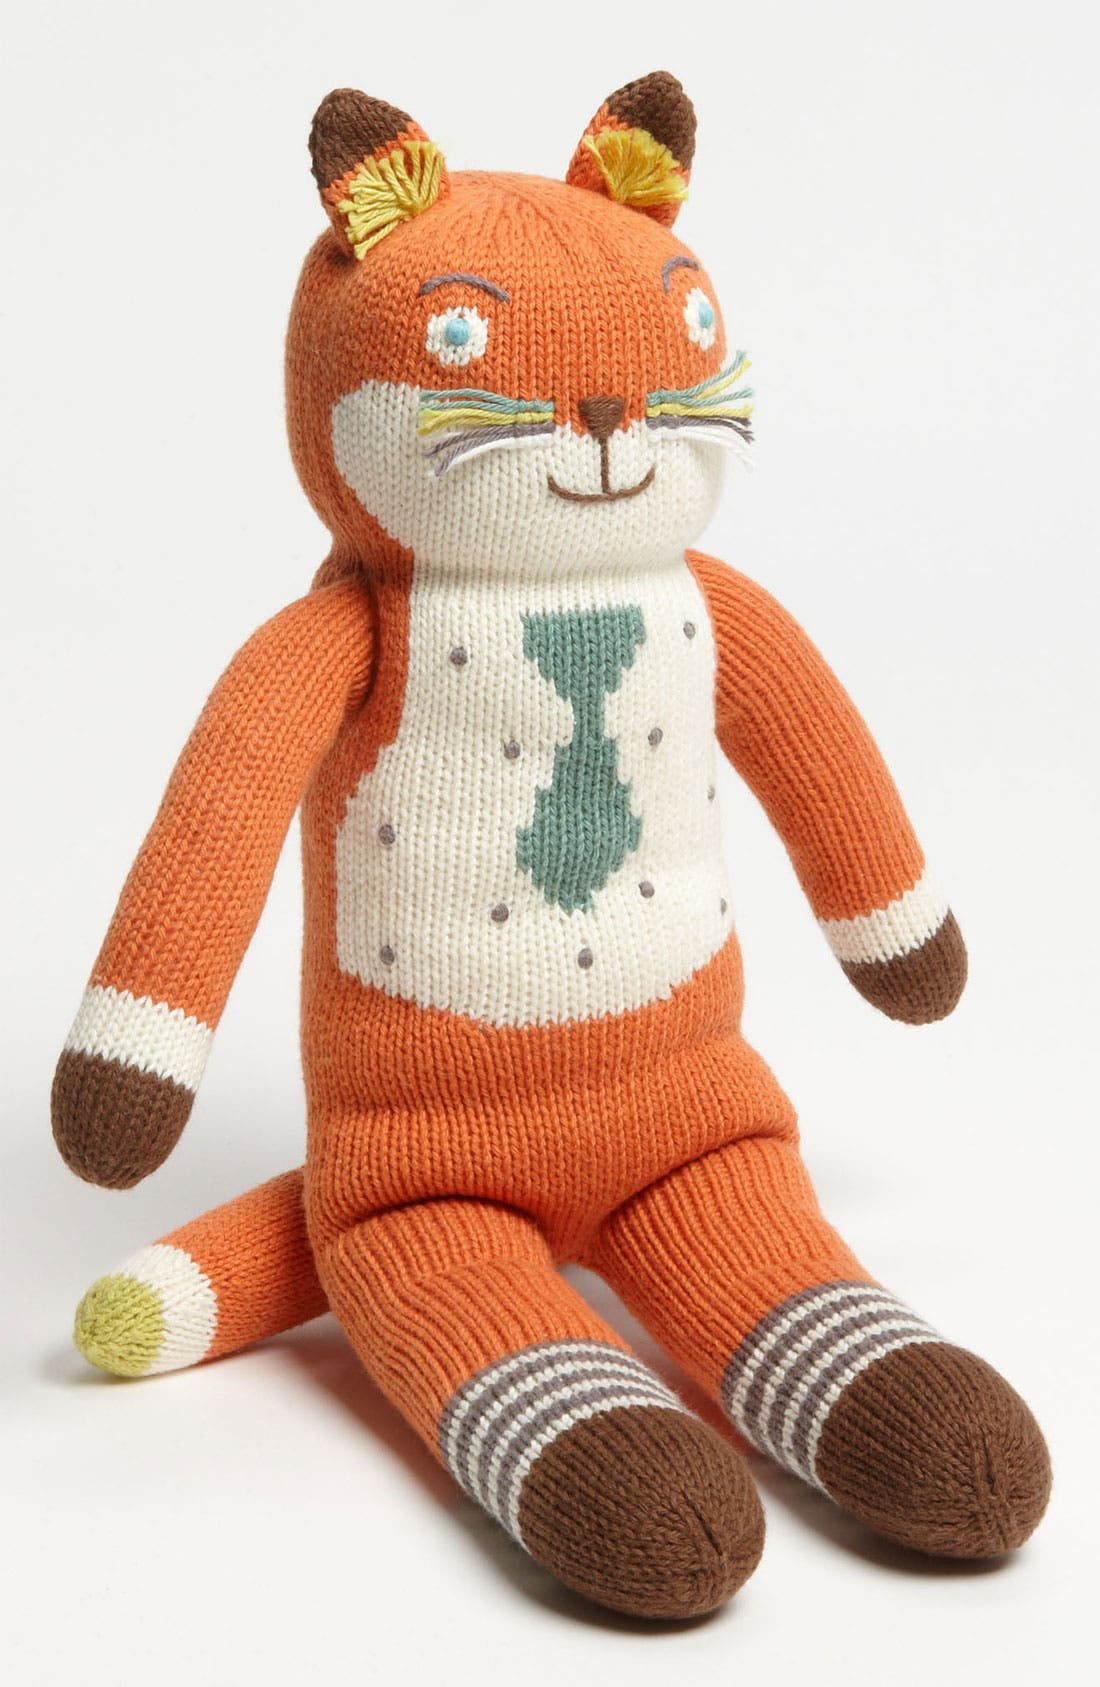 Alternate Image 1 Selected - Blabla 'Socks the Fox' Knit Doll